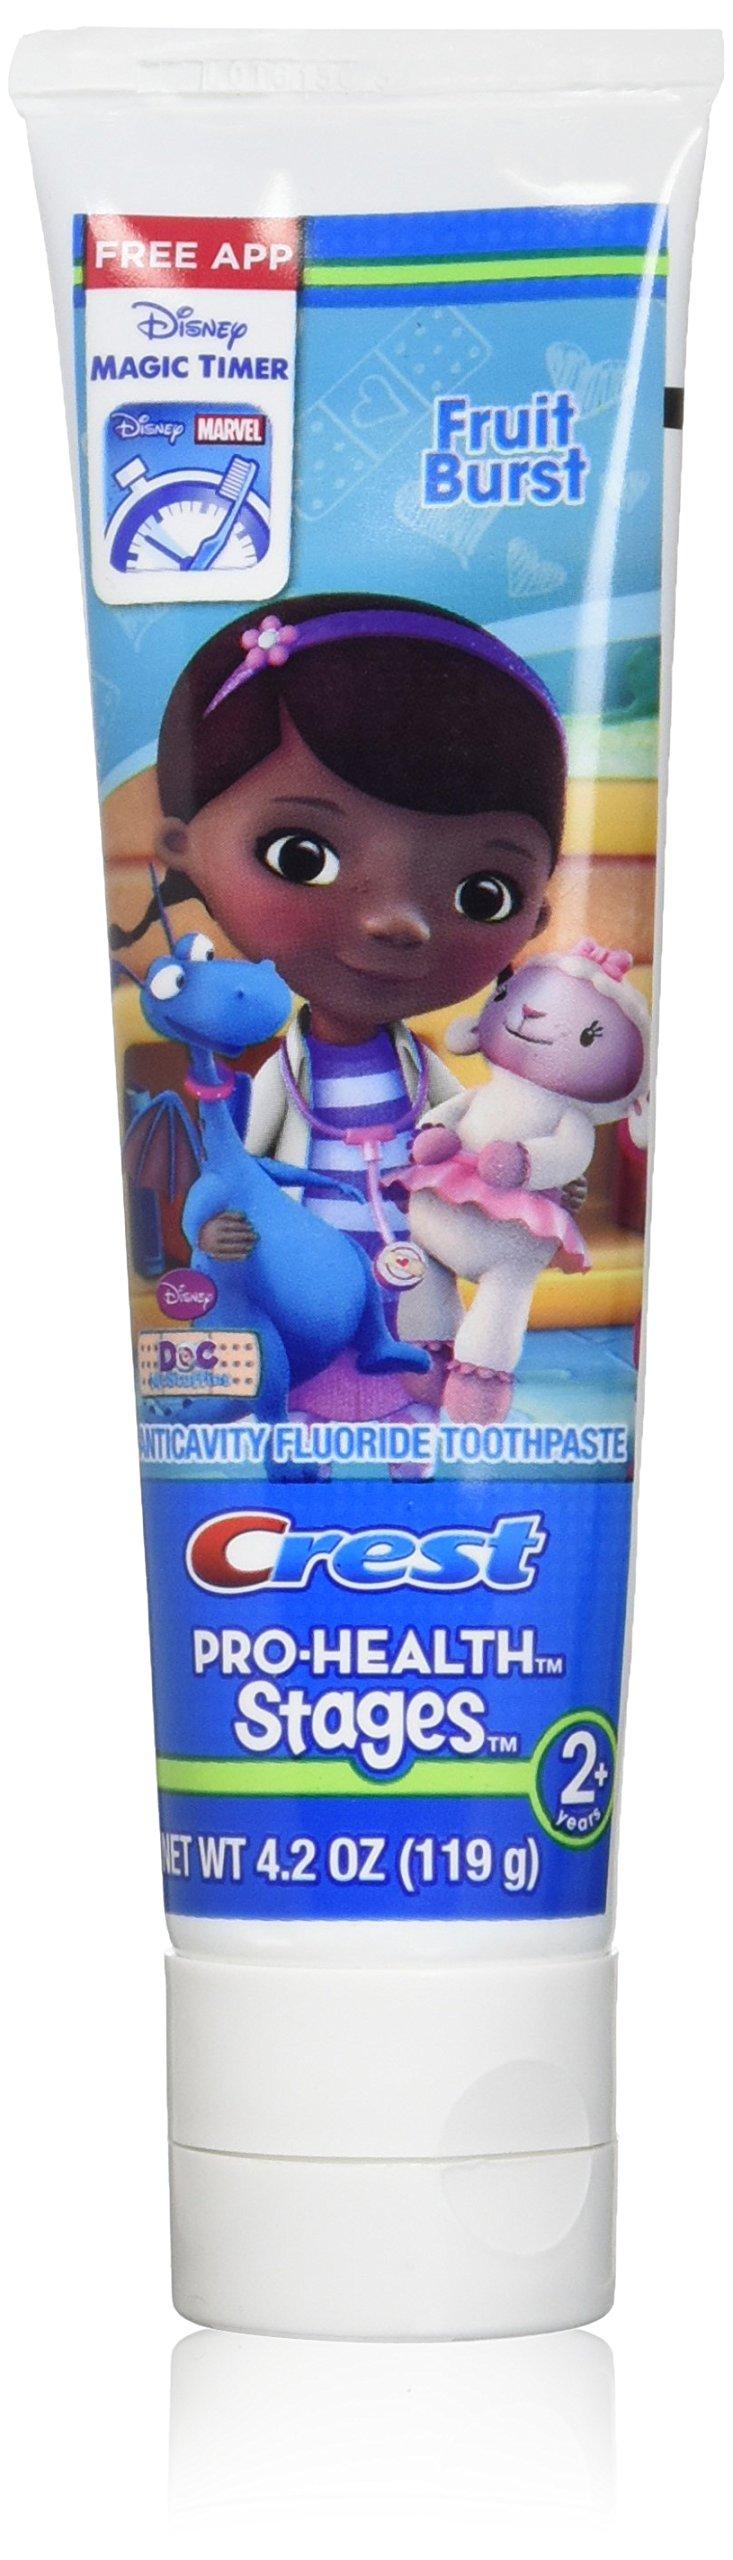 Crest Pro-Health Stages Disney Jr. Doc Mcstuffins 2+ Years, Fruit Burst Toothpaste 4.20 oz ( Pack of 12)